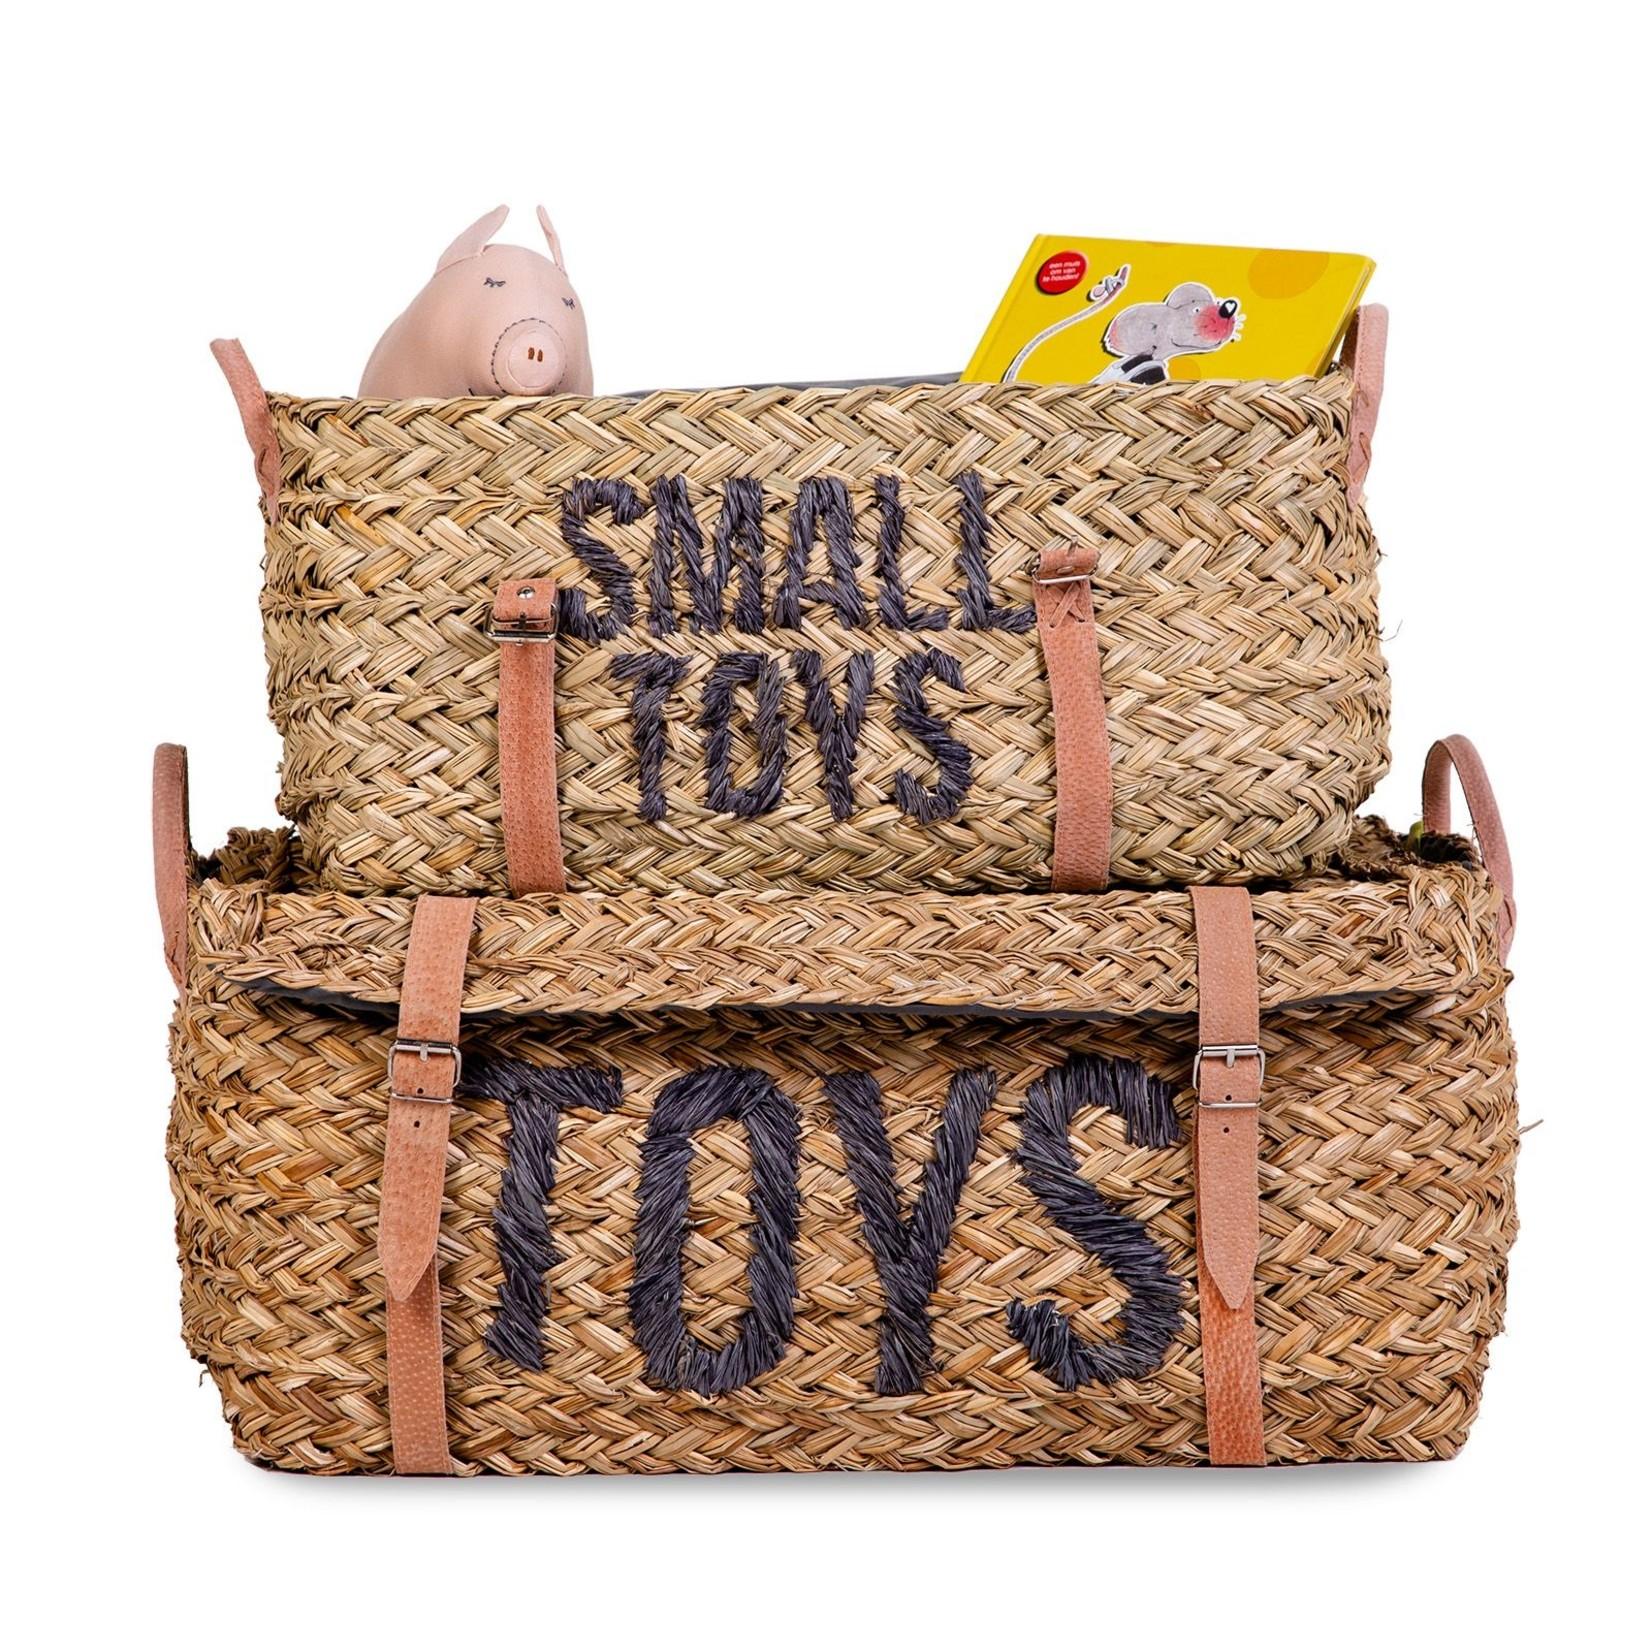 Childhome Childhome Set van 2 Rattan Manden met riemen 'Toys & Small Toys'